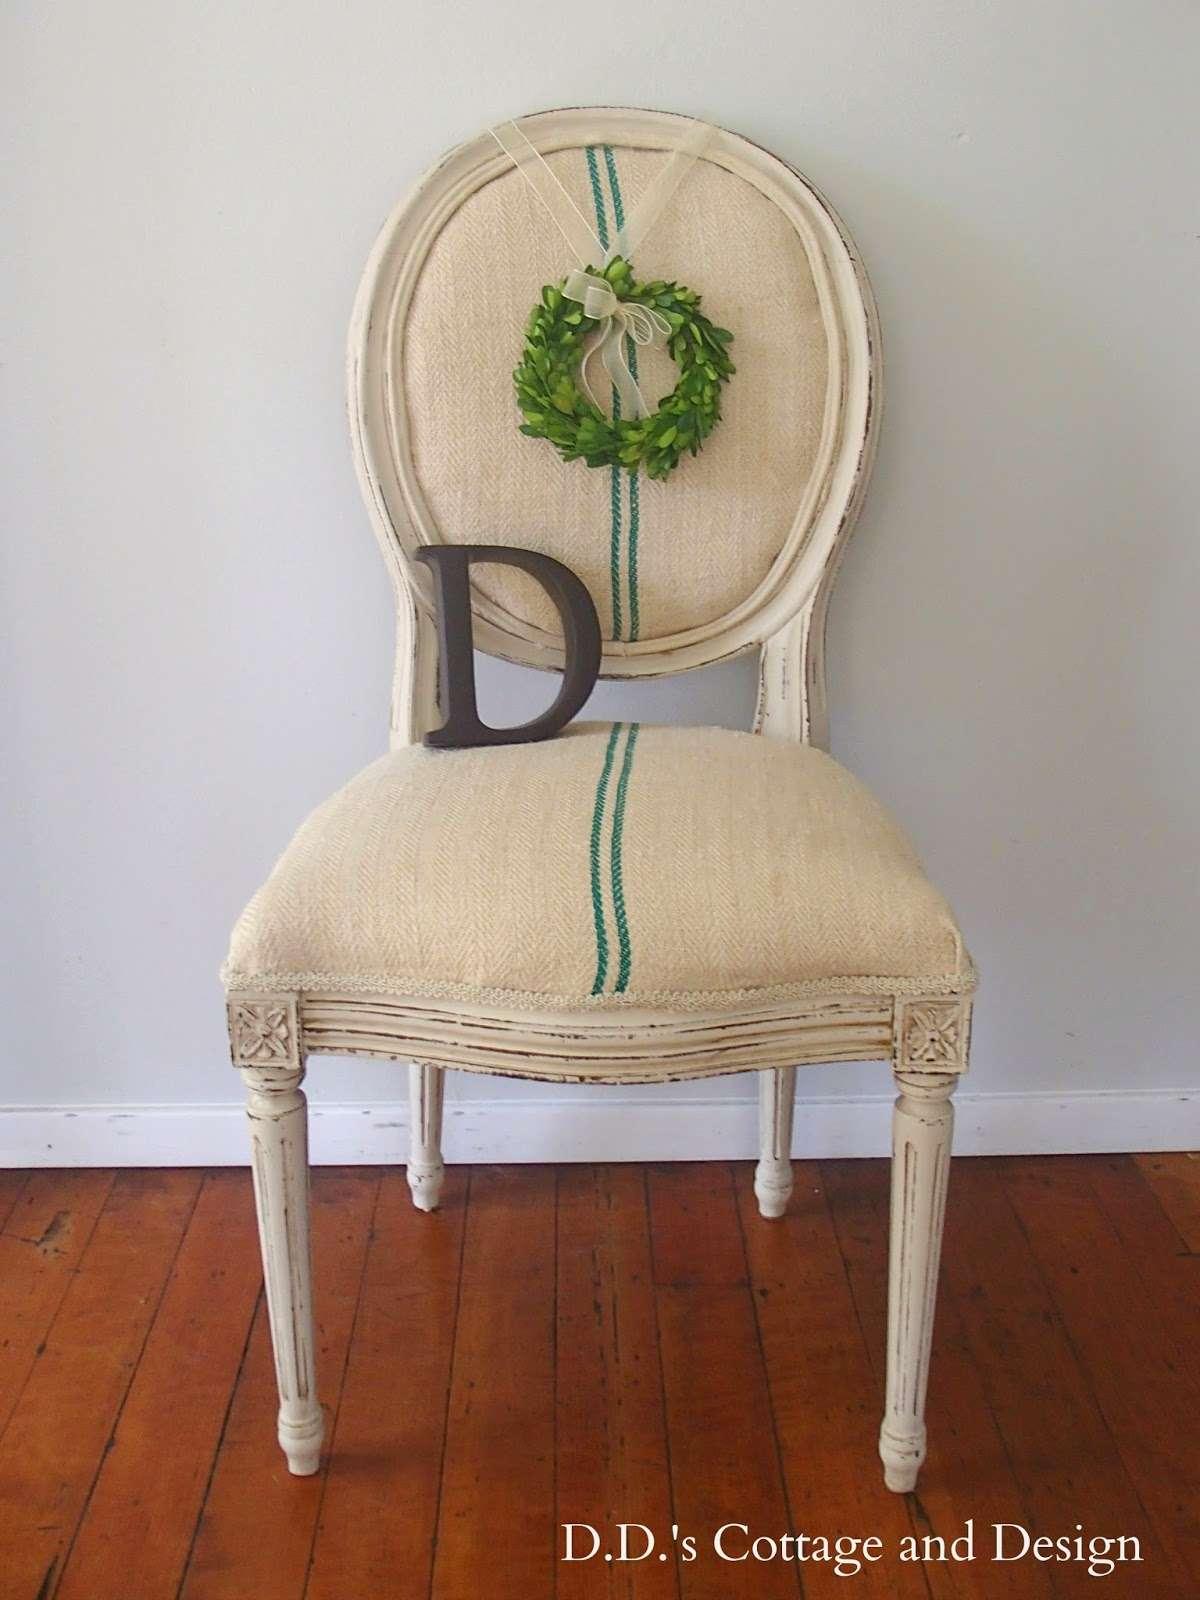 ddscottage chair makeover grain sack